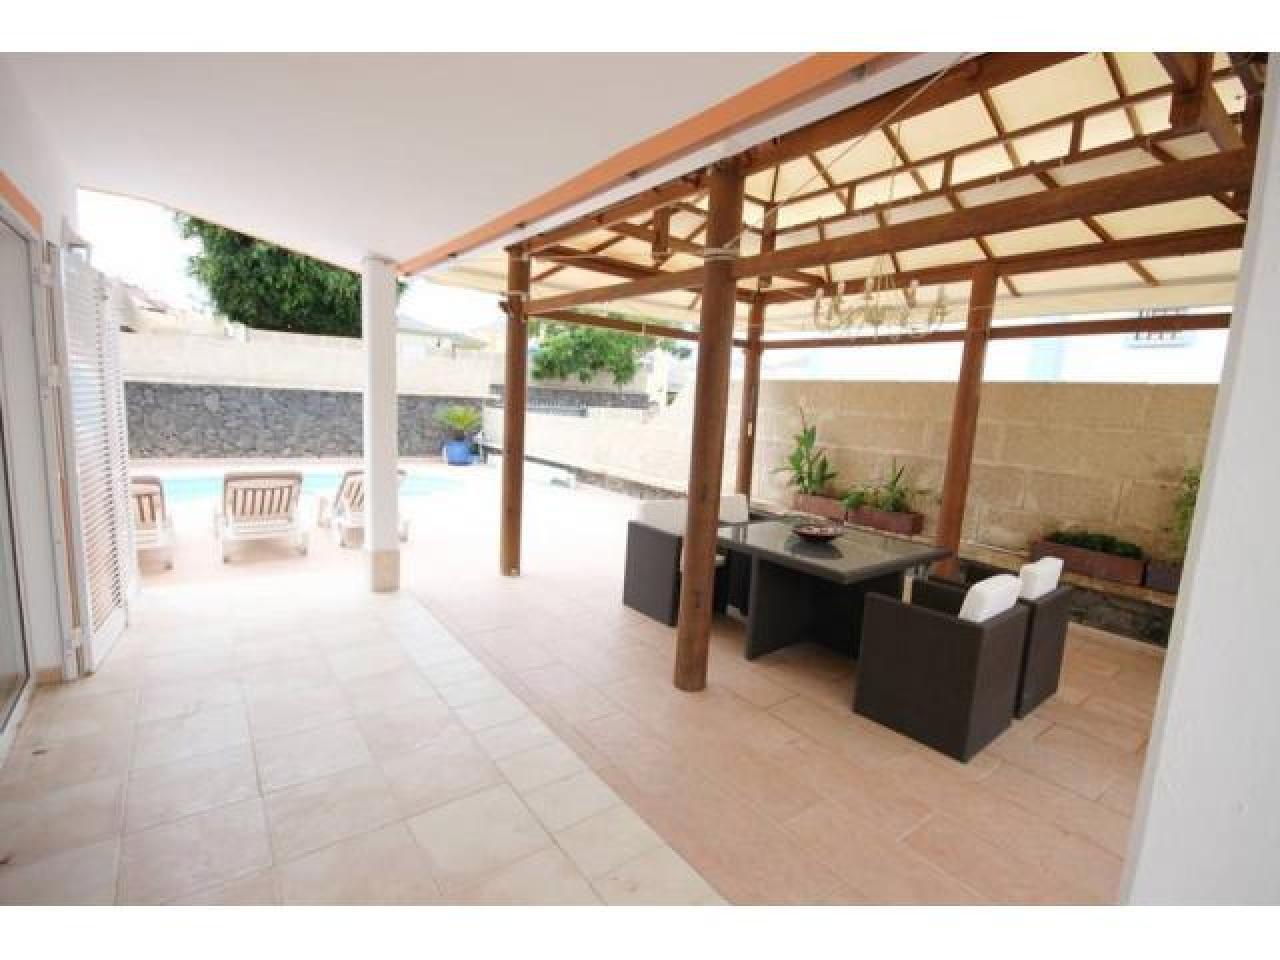 Villa in Tenerife for rent, in Costa Adeje, Madronal de Fanabe - 1